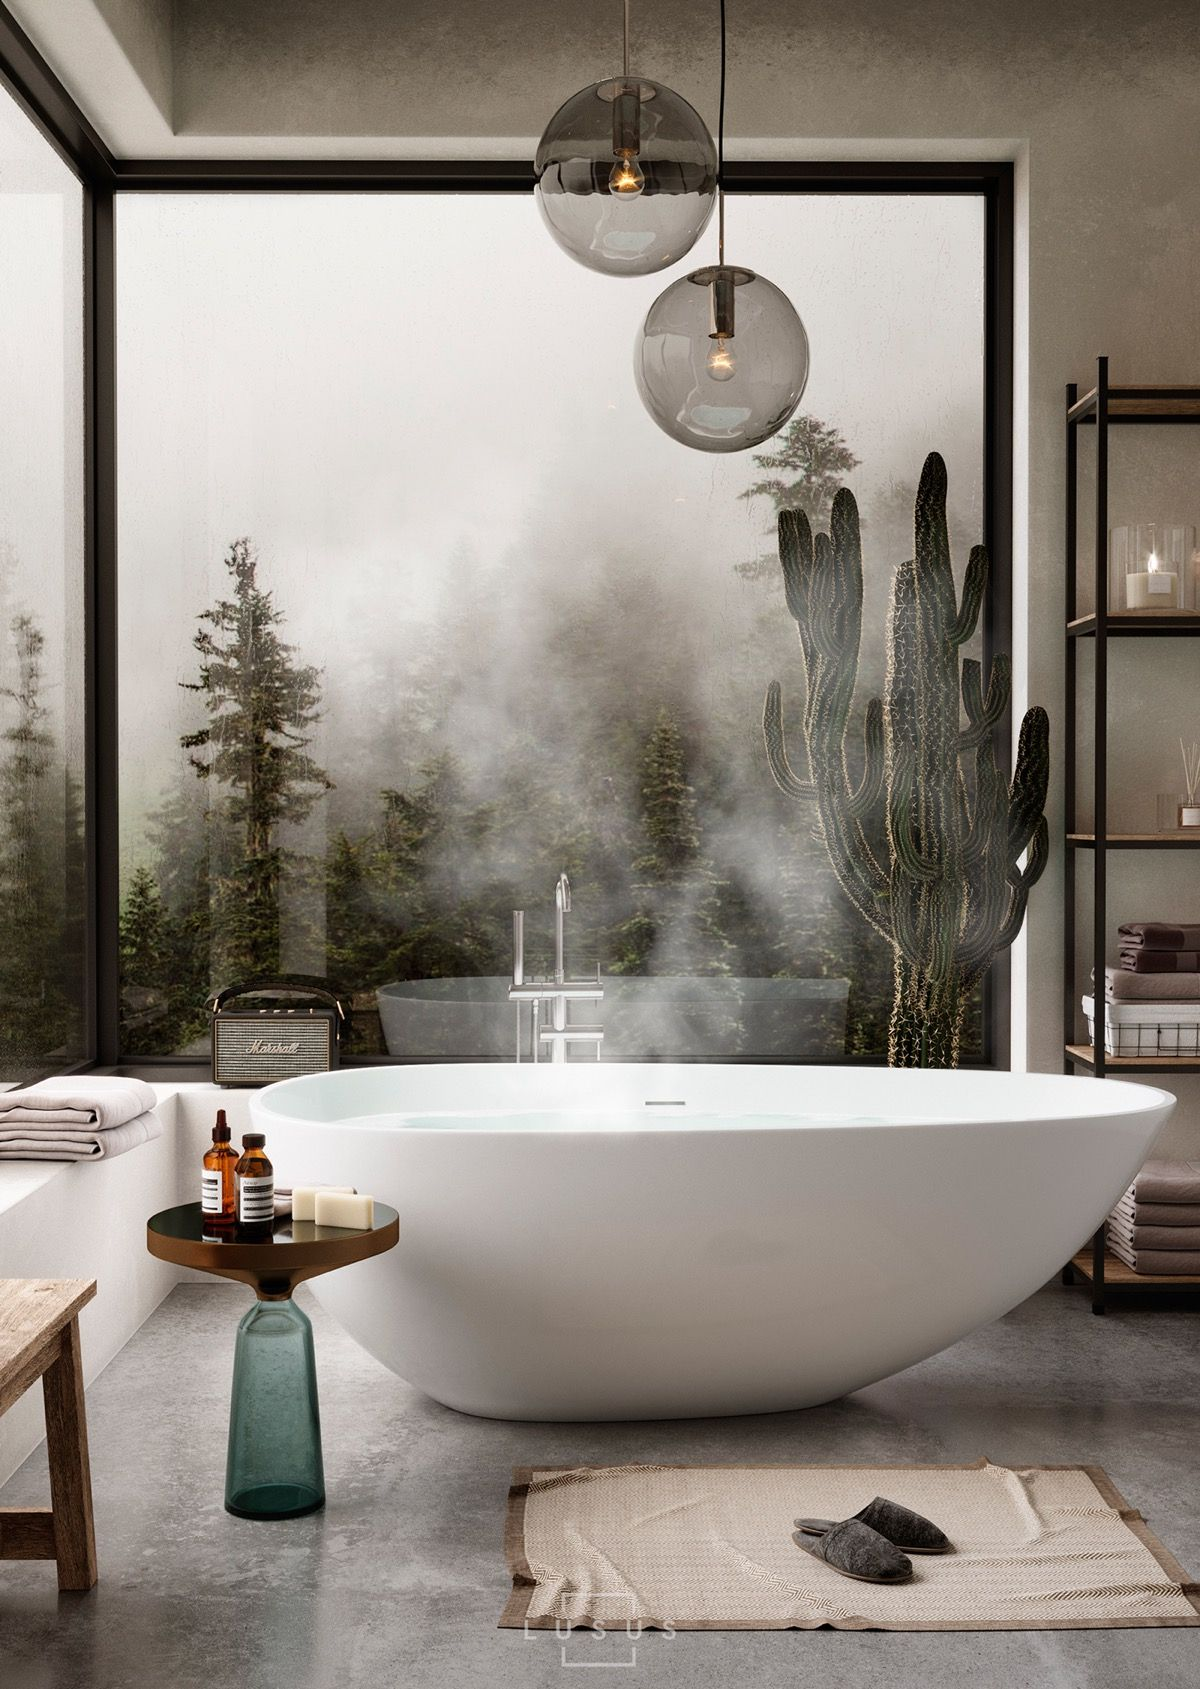 Luxury Bathroom Mirrors With Lights